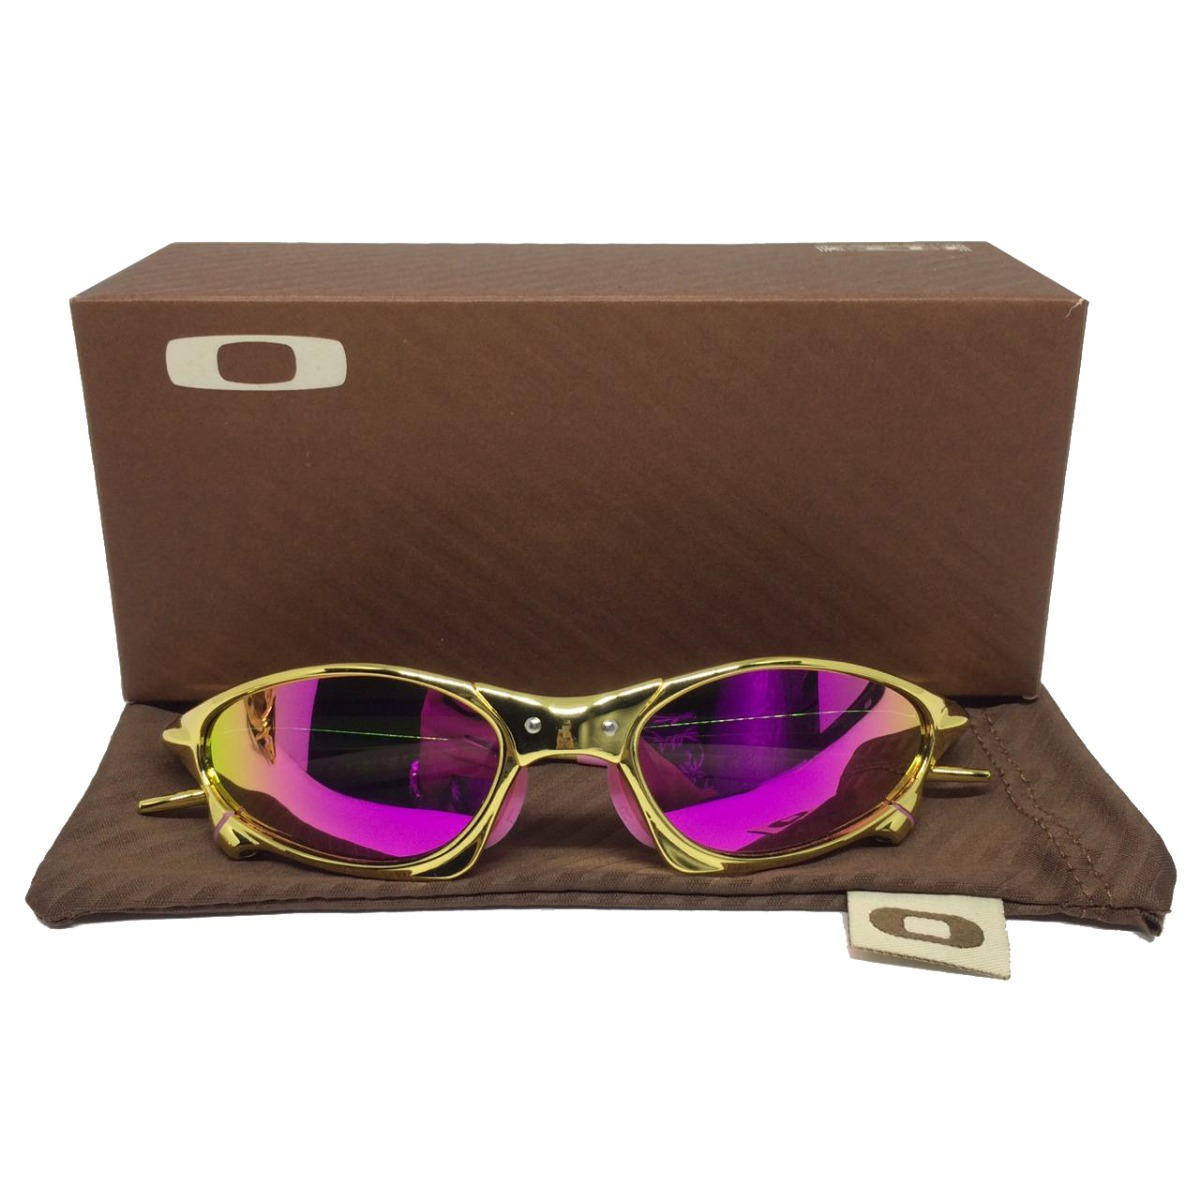 daddc6382183f óculos oakley juliet gold 24k lente rosa mega promoção. Carregando zoom.